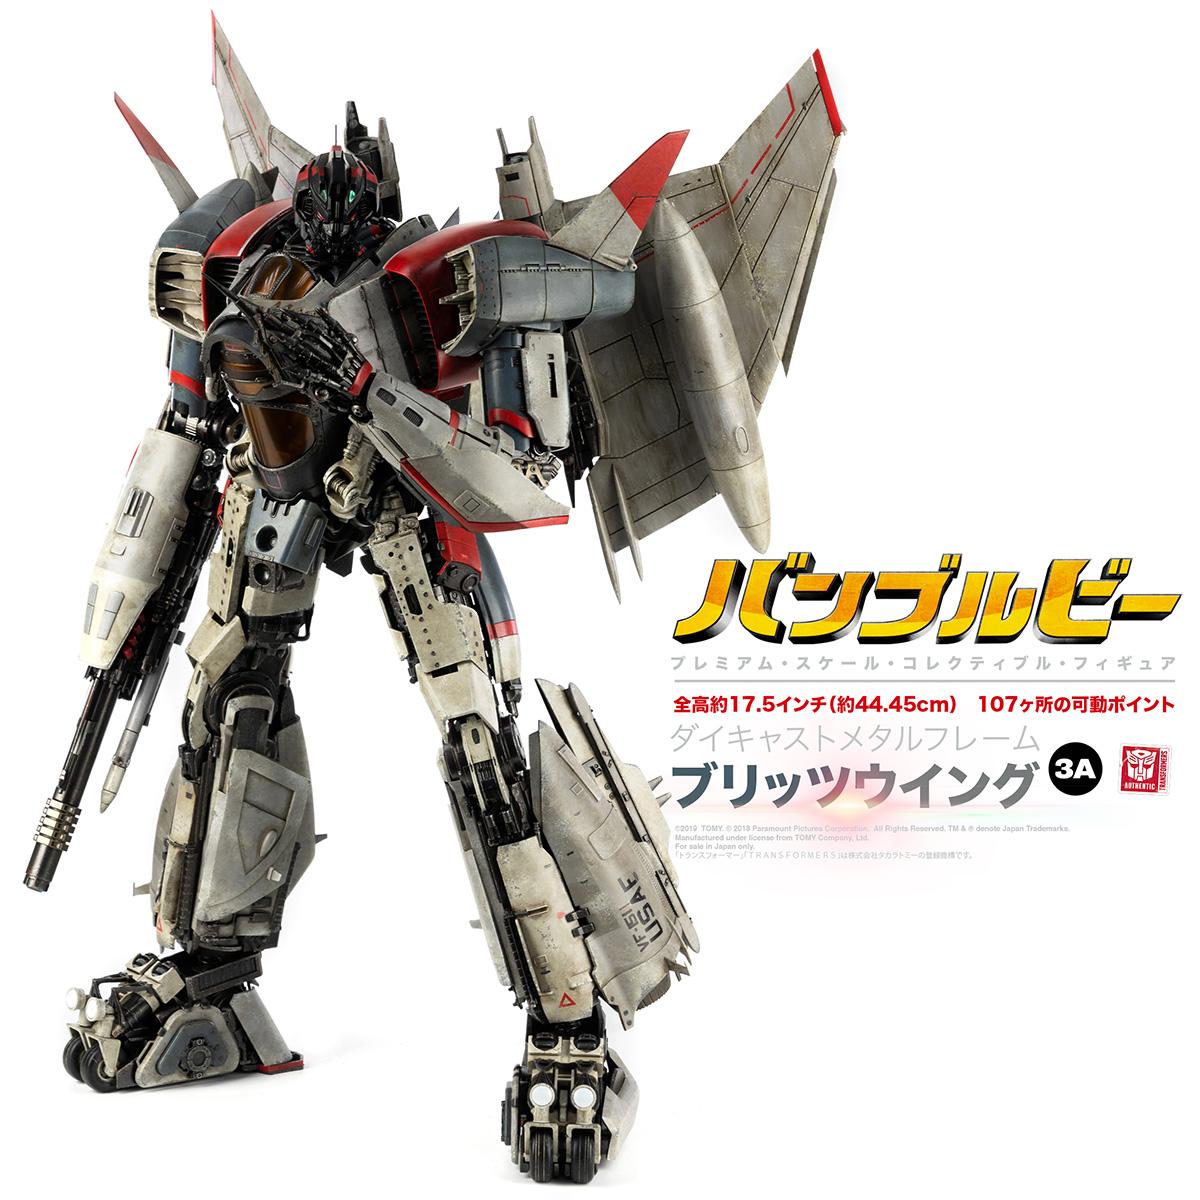 Blitzwing_PM_JAP_1004.jpg